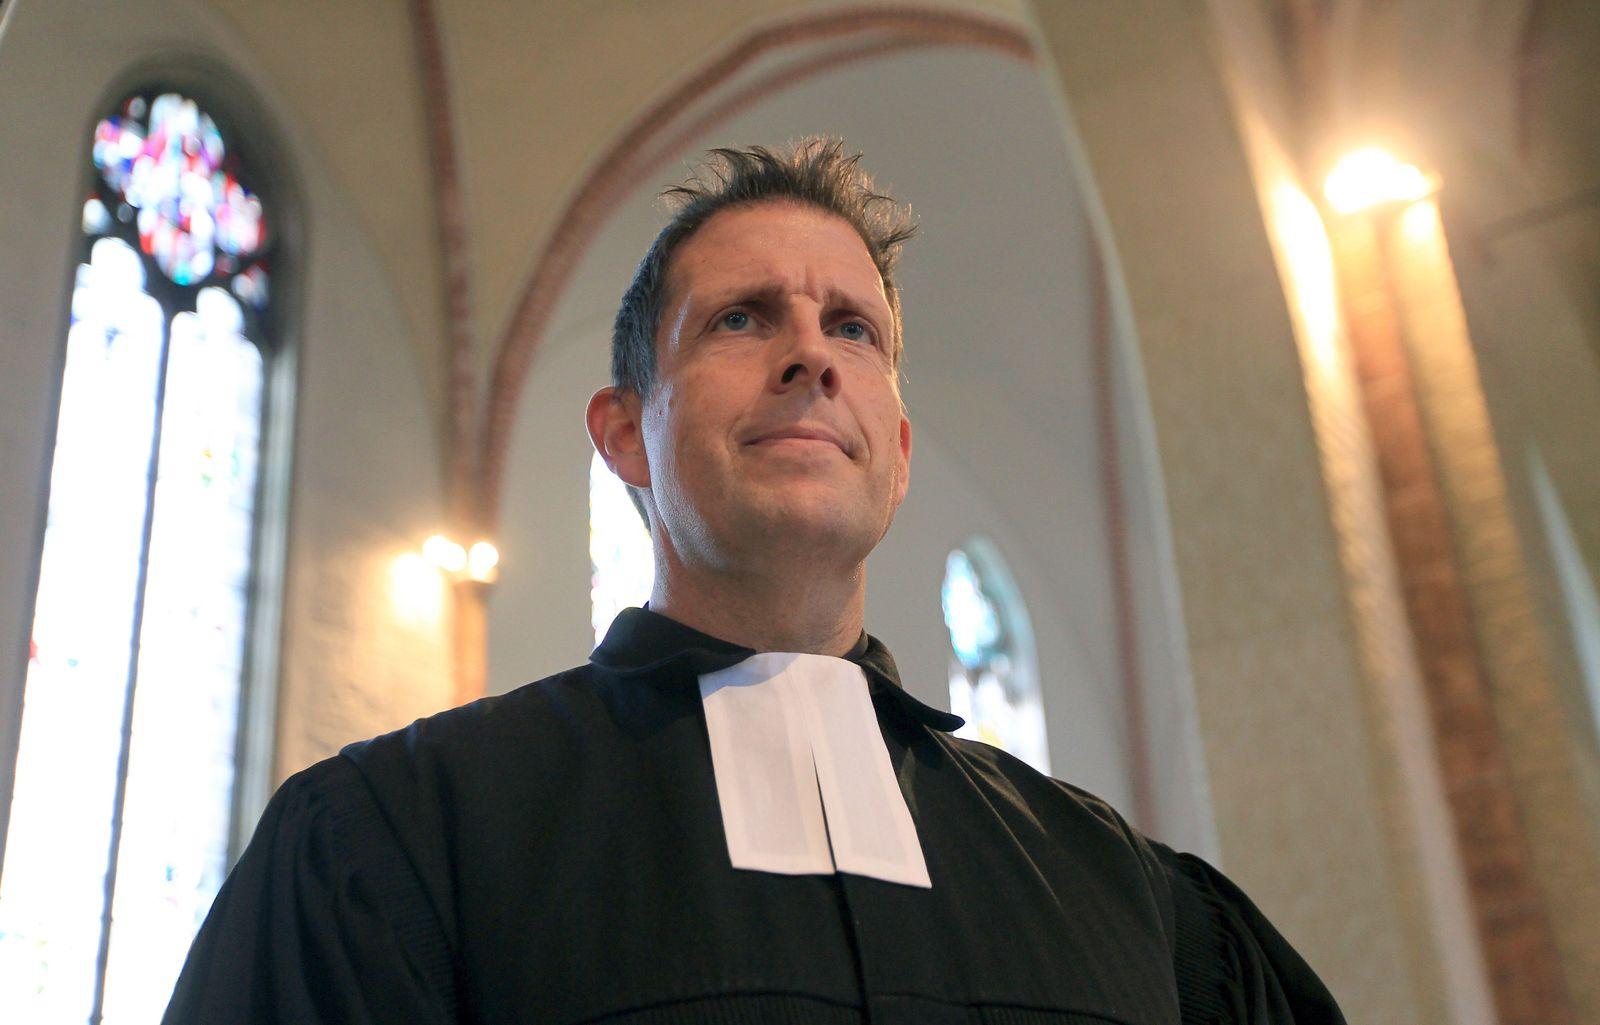 Pastor Olaf Latze